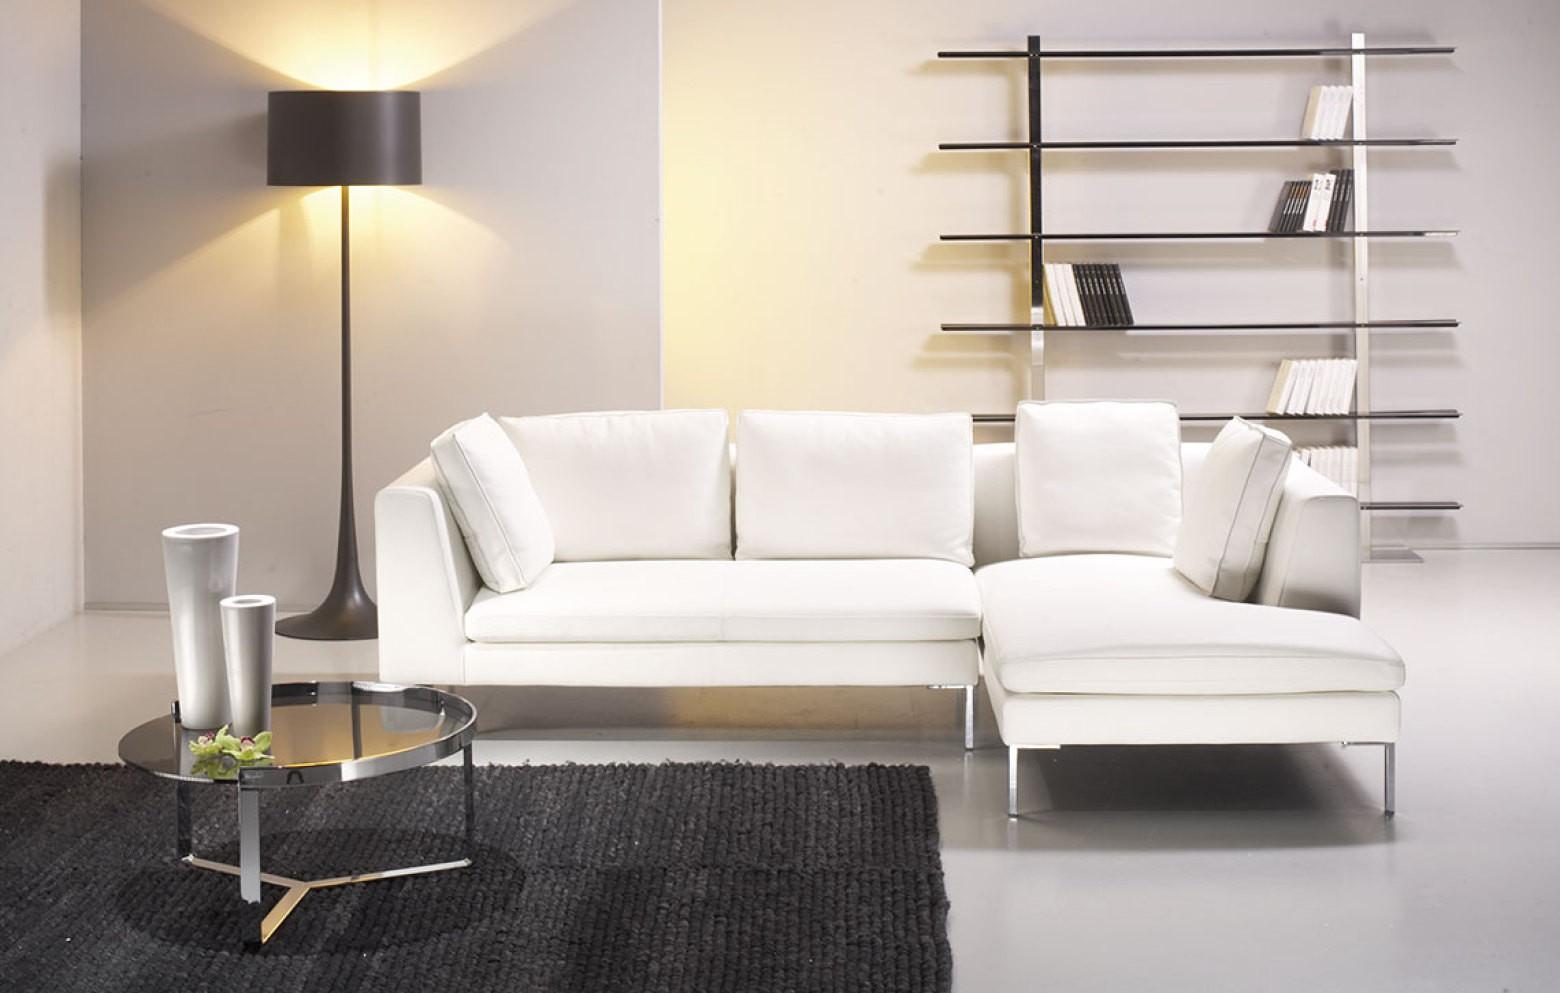 designer ecksofa luca g nstig bei who 39 s perfect kaufen. Black Bedroom Furniture Sets. Home Design Ideas